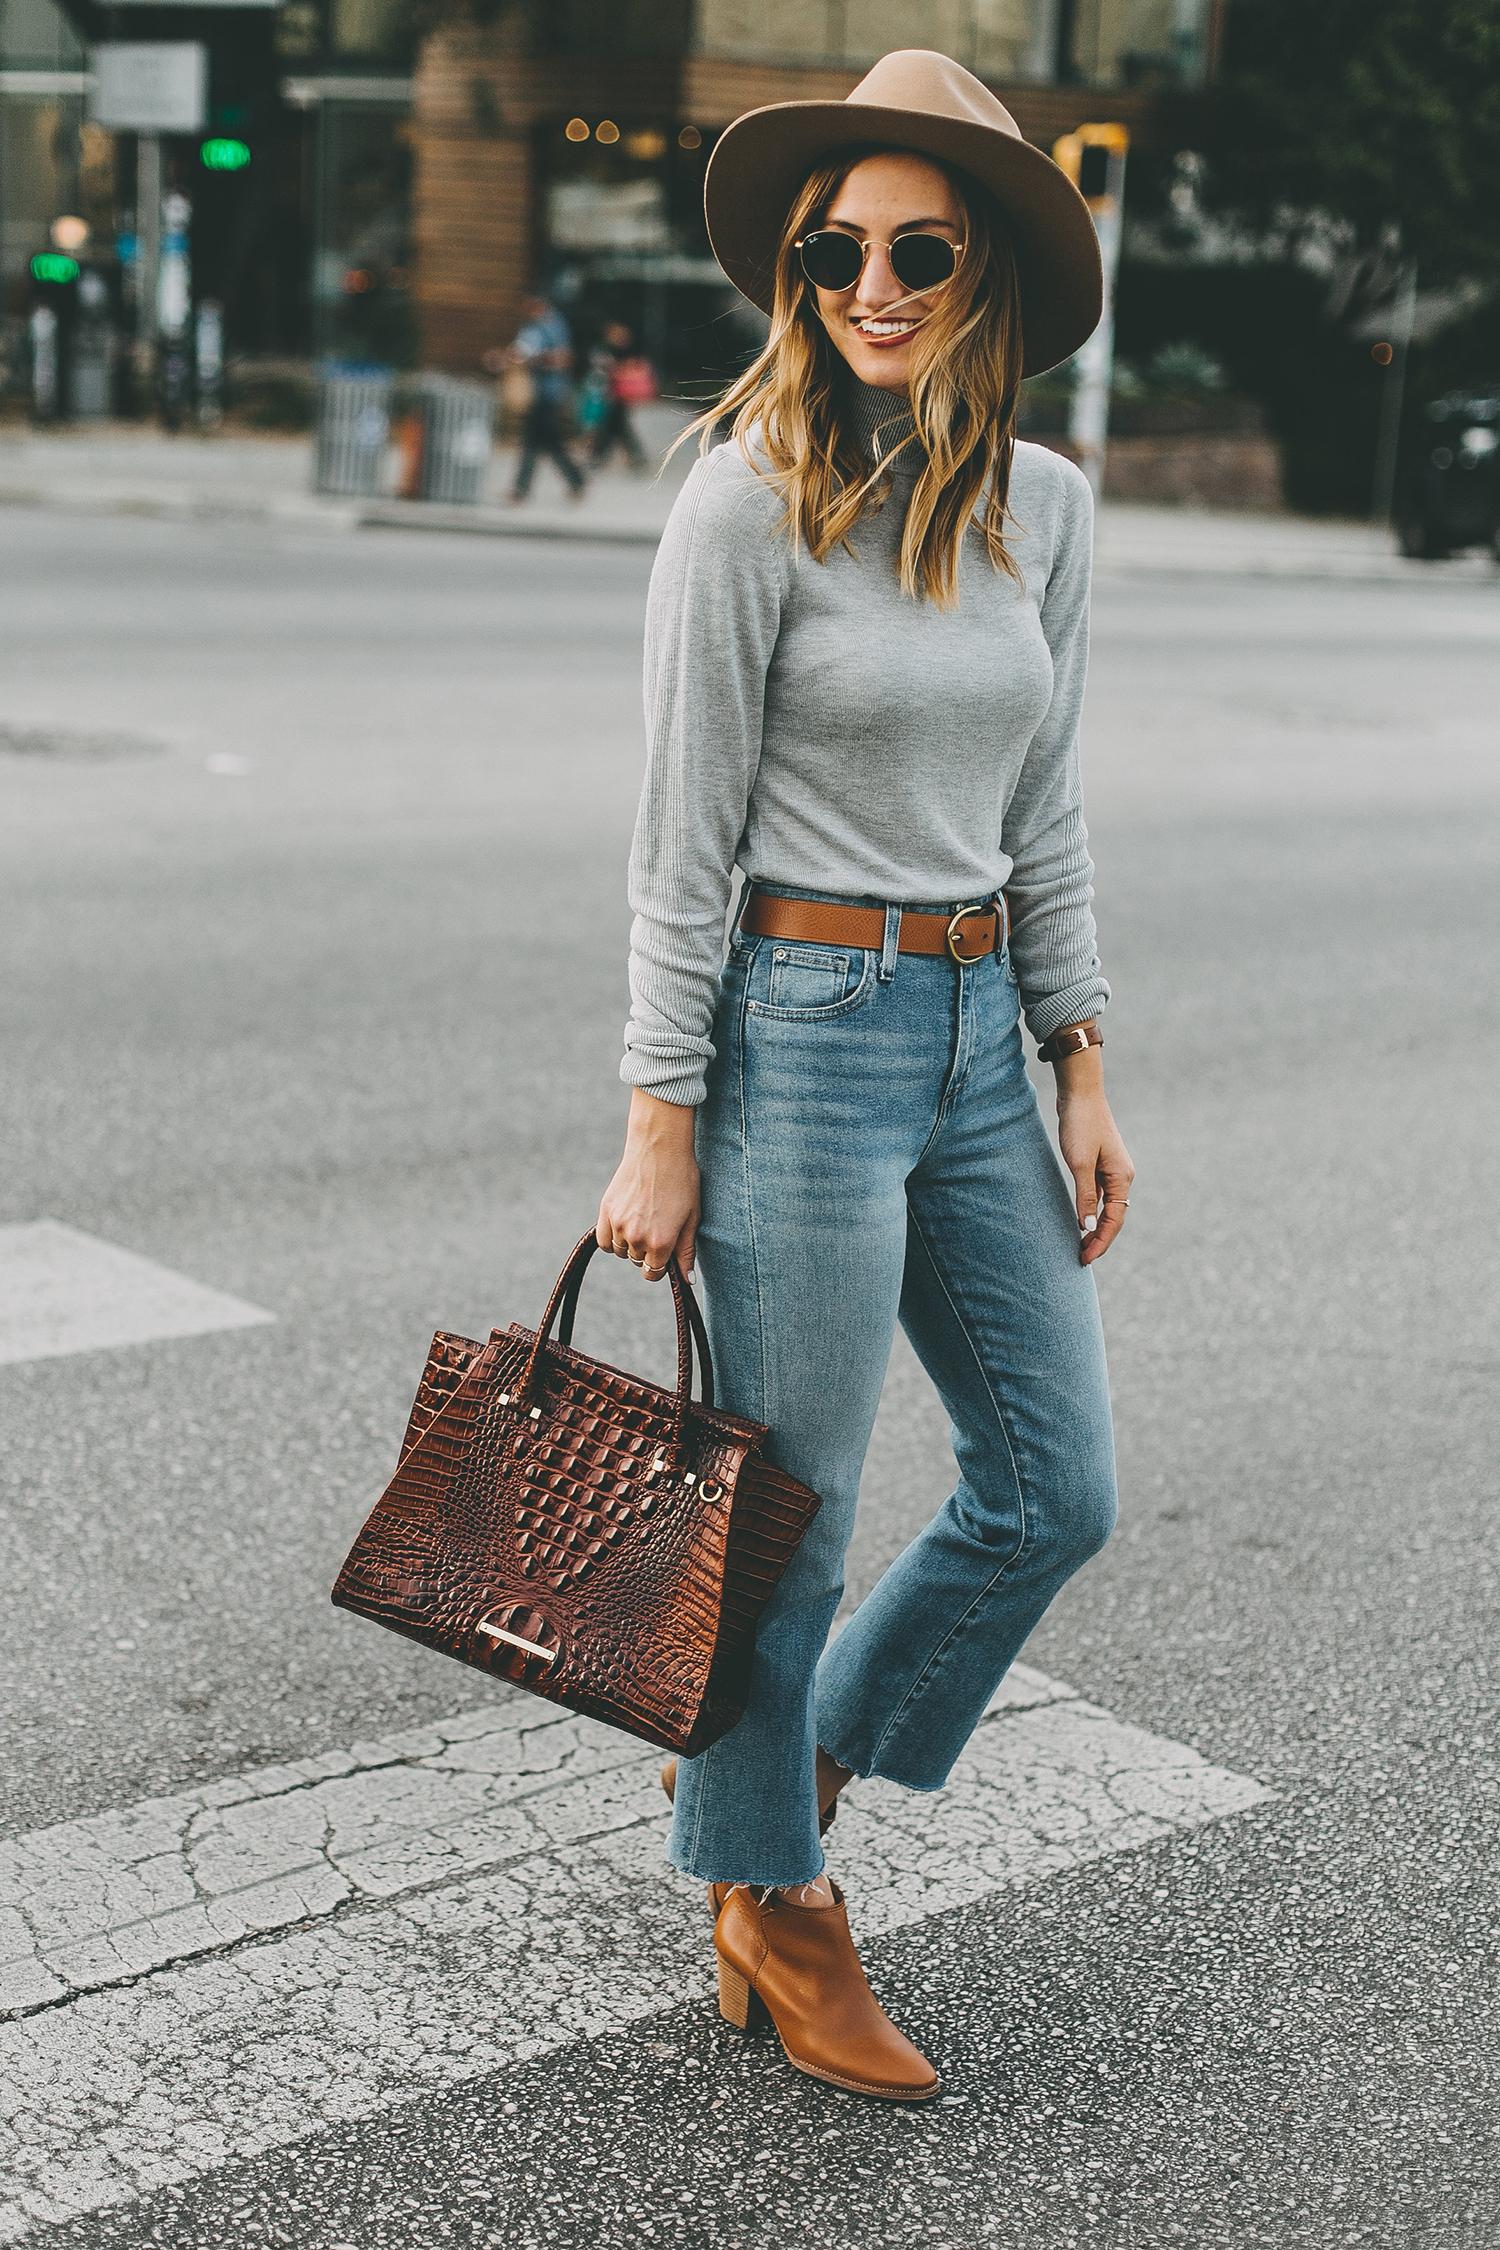 livvyland-blog-olivia-watson-south-congress-avenue-austin-texas-fashion-life-style-blogger-bdg-high-waist-crop-flare-jeans-7